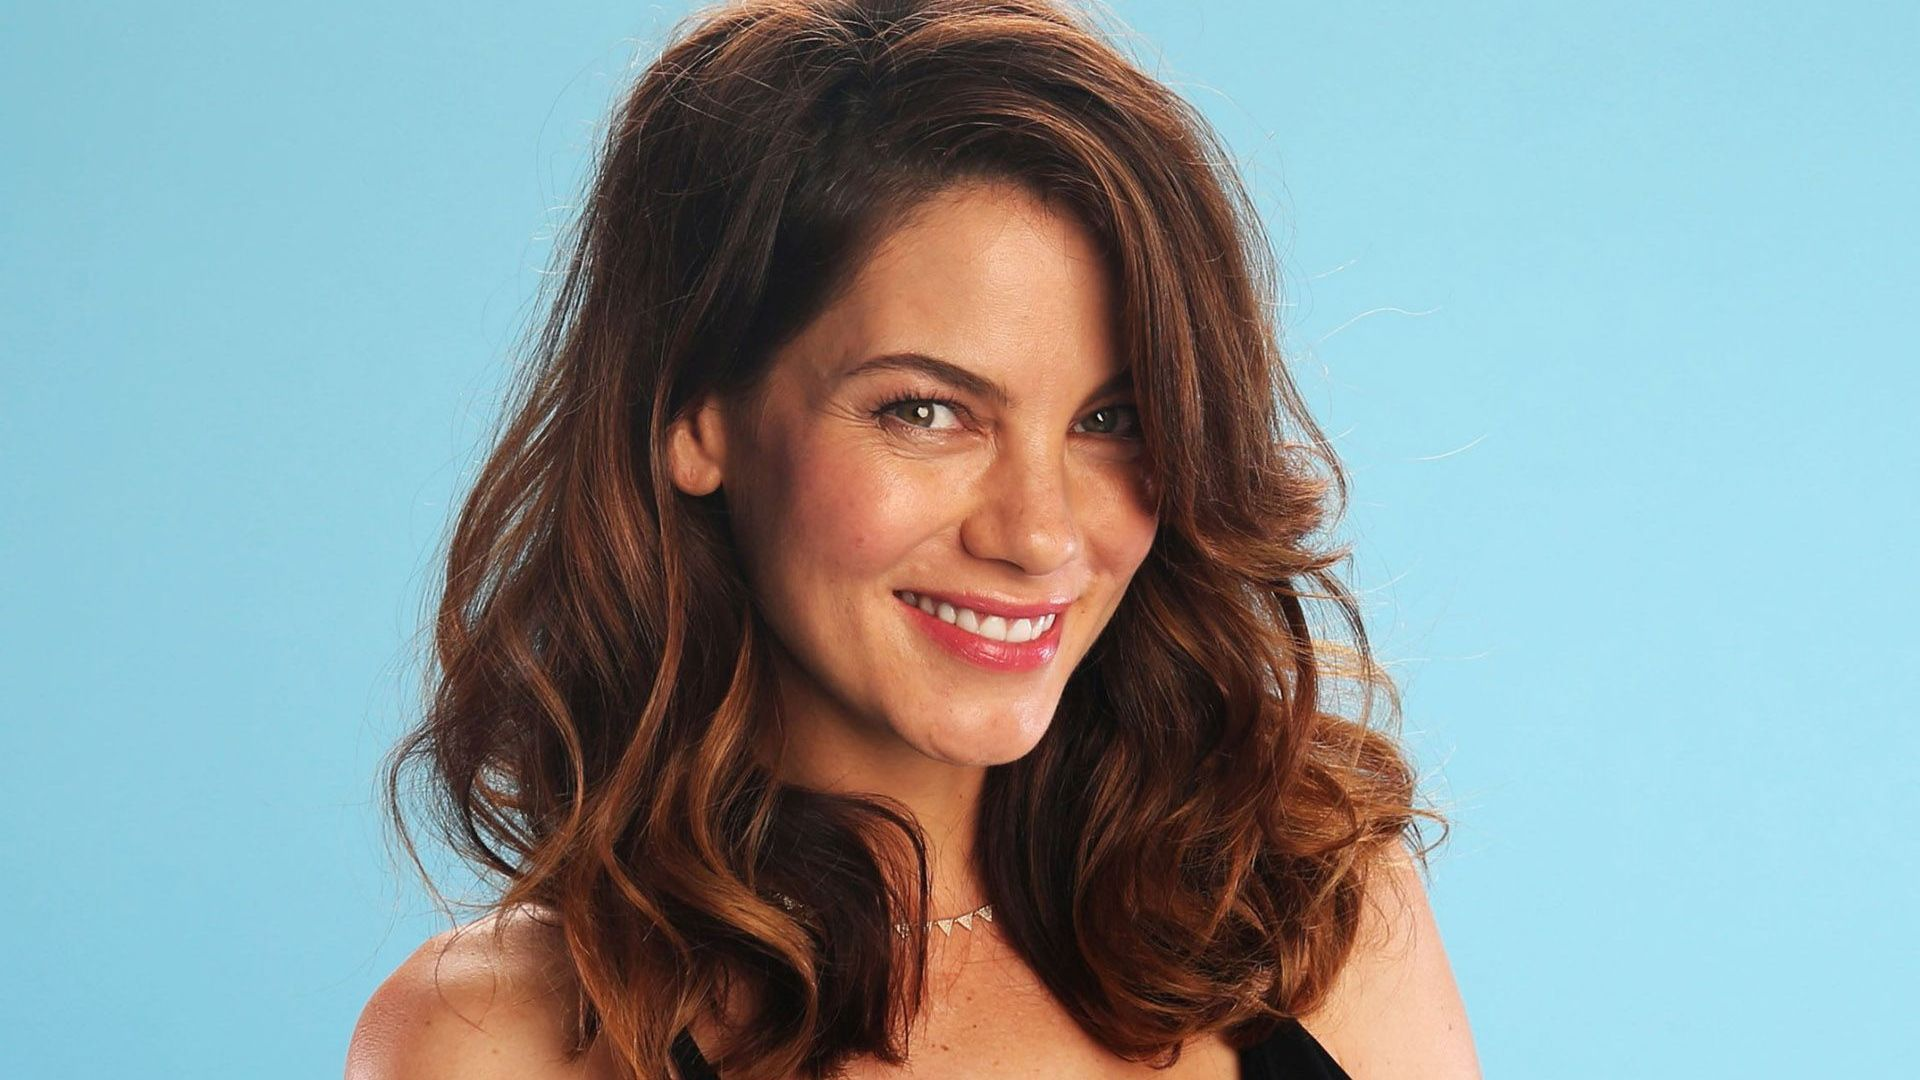 michelle monaghan celebrity smile wallpaper 53590